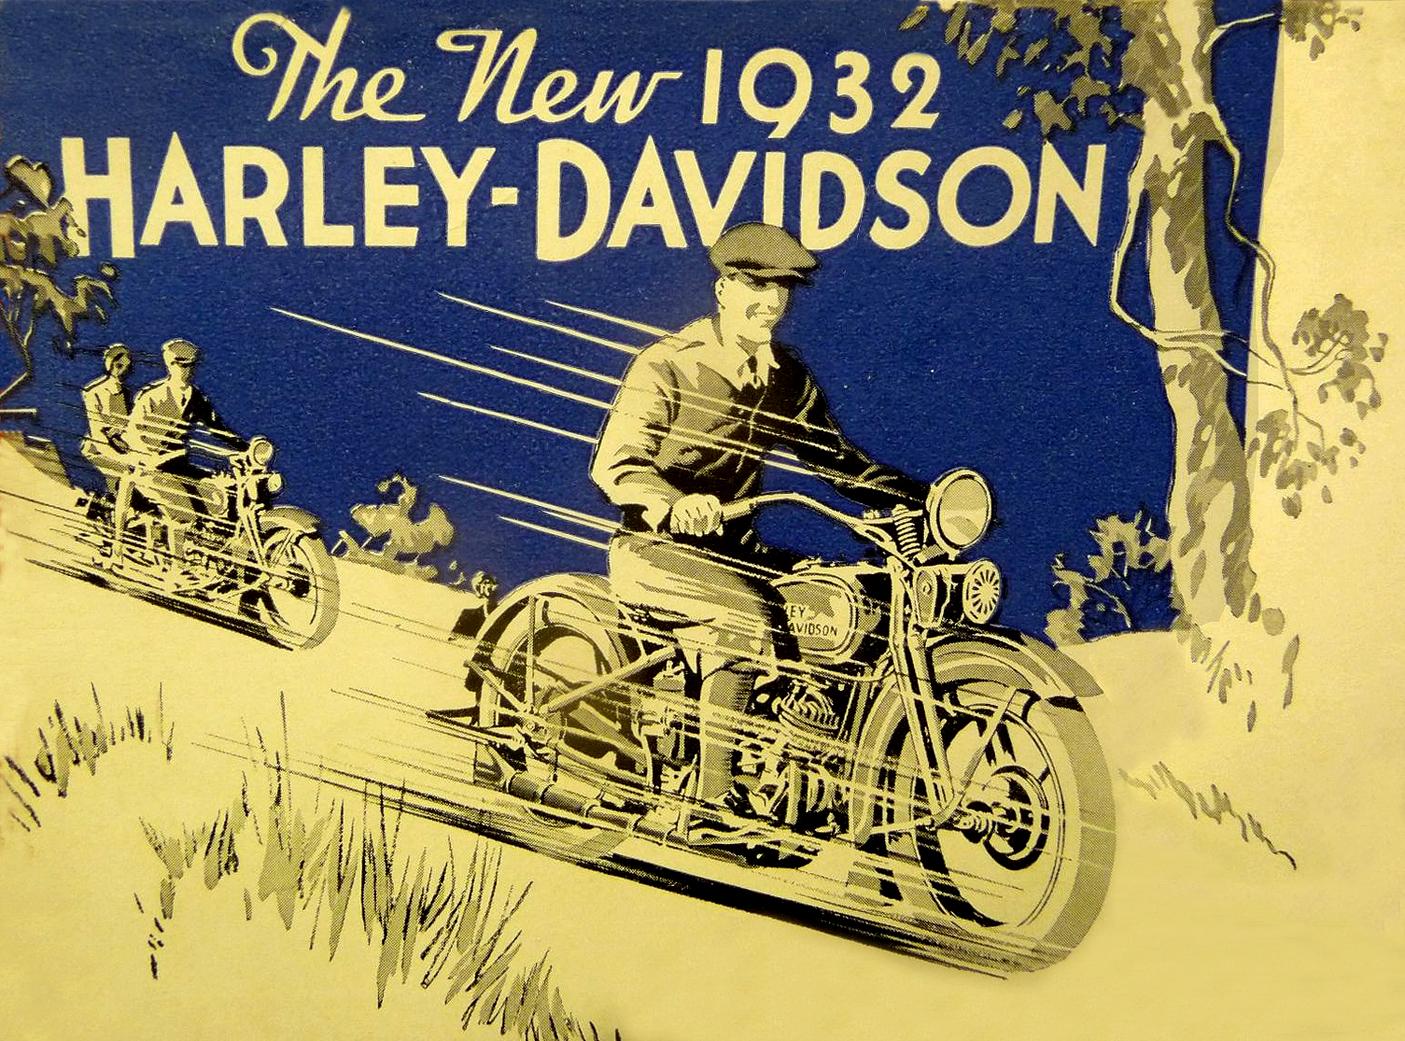 The New 1932 Harley-Davidson